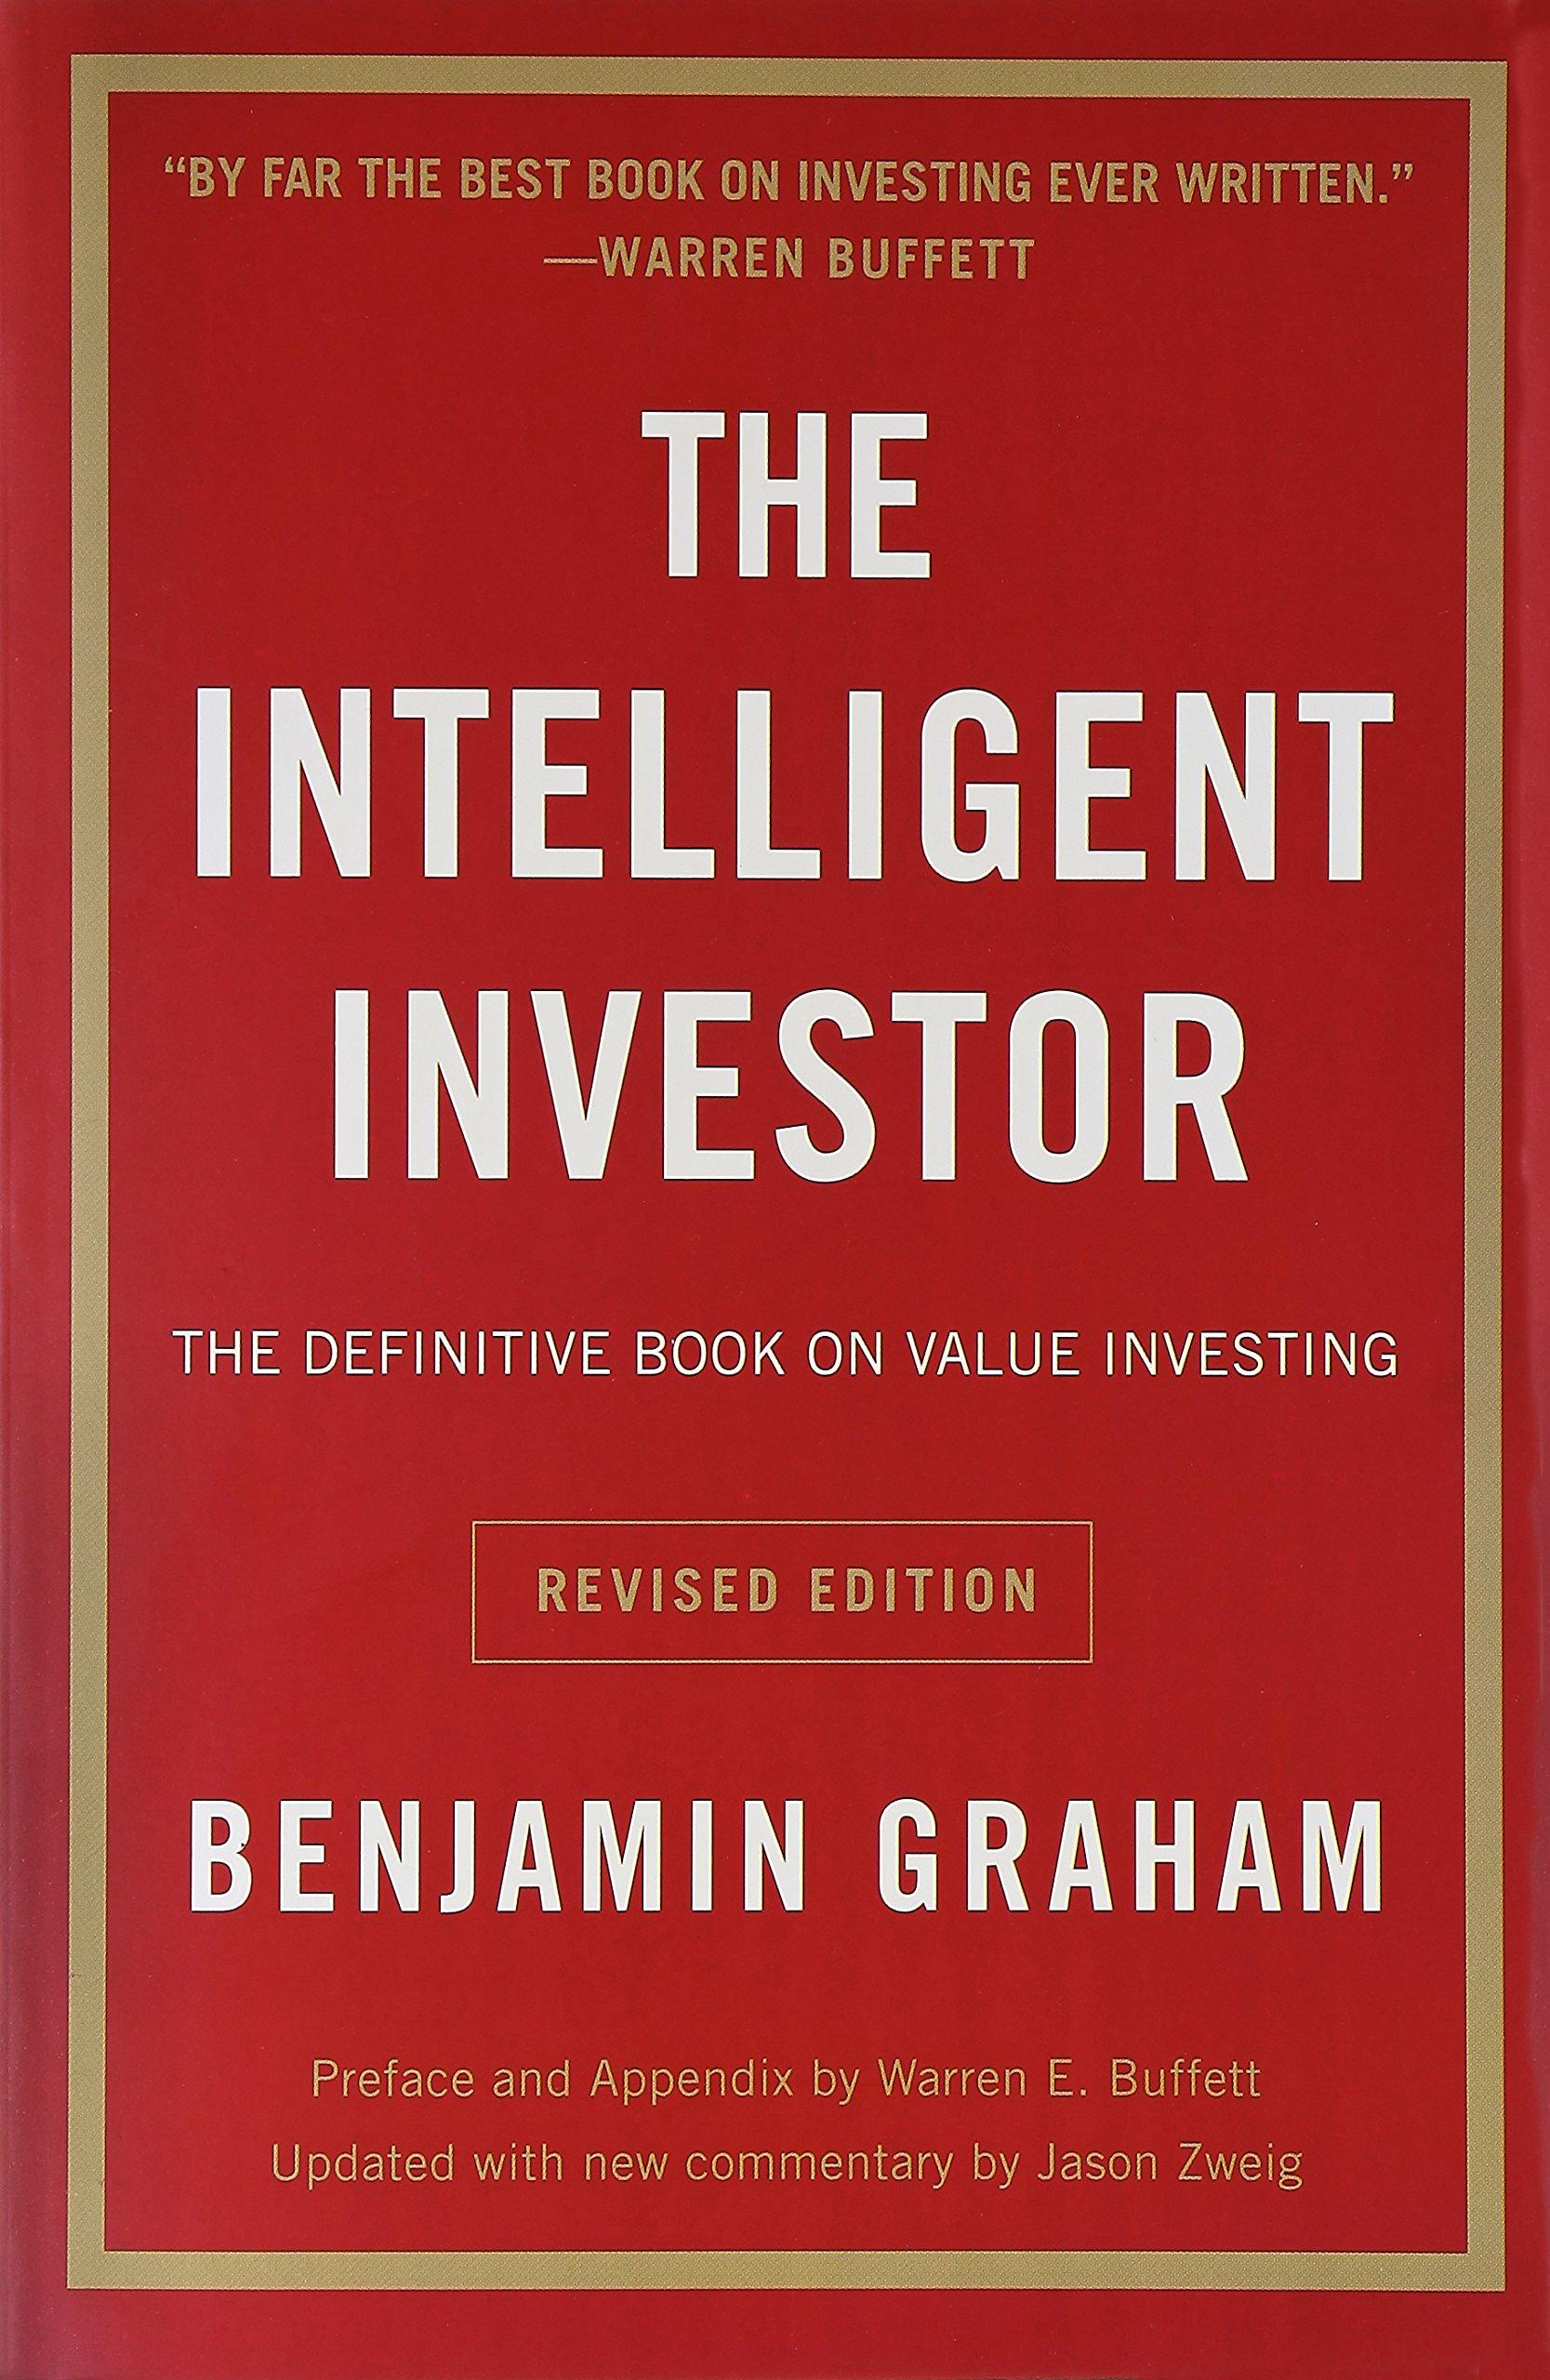 The Intelligent Investor - Best Books